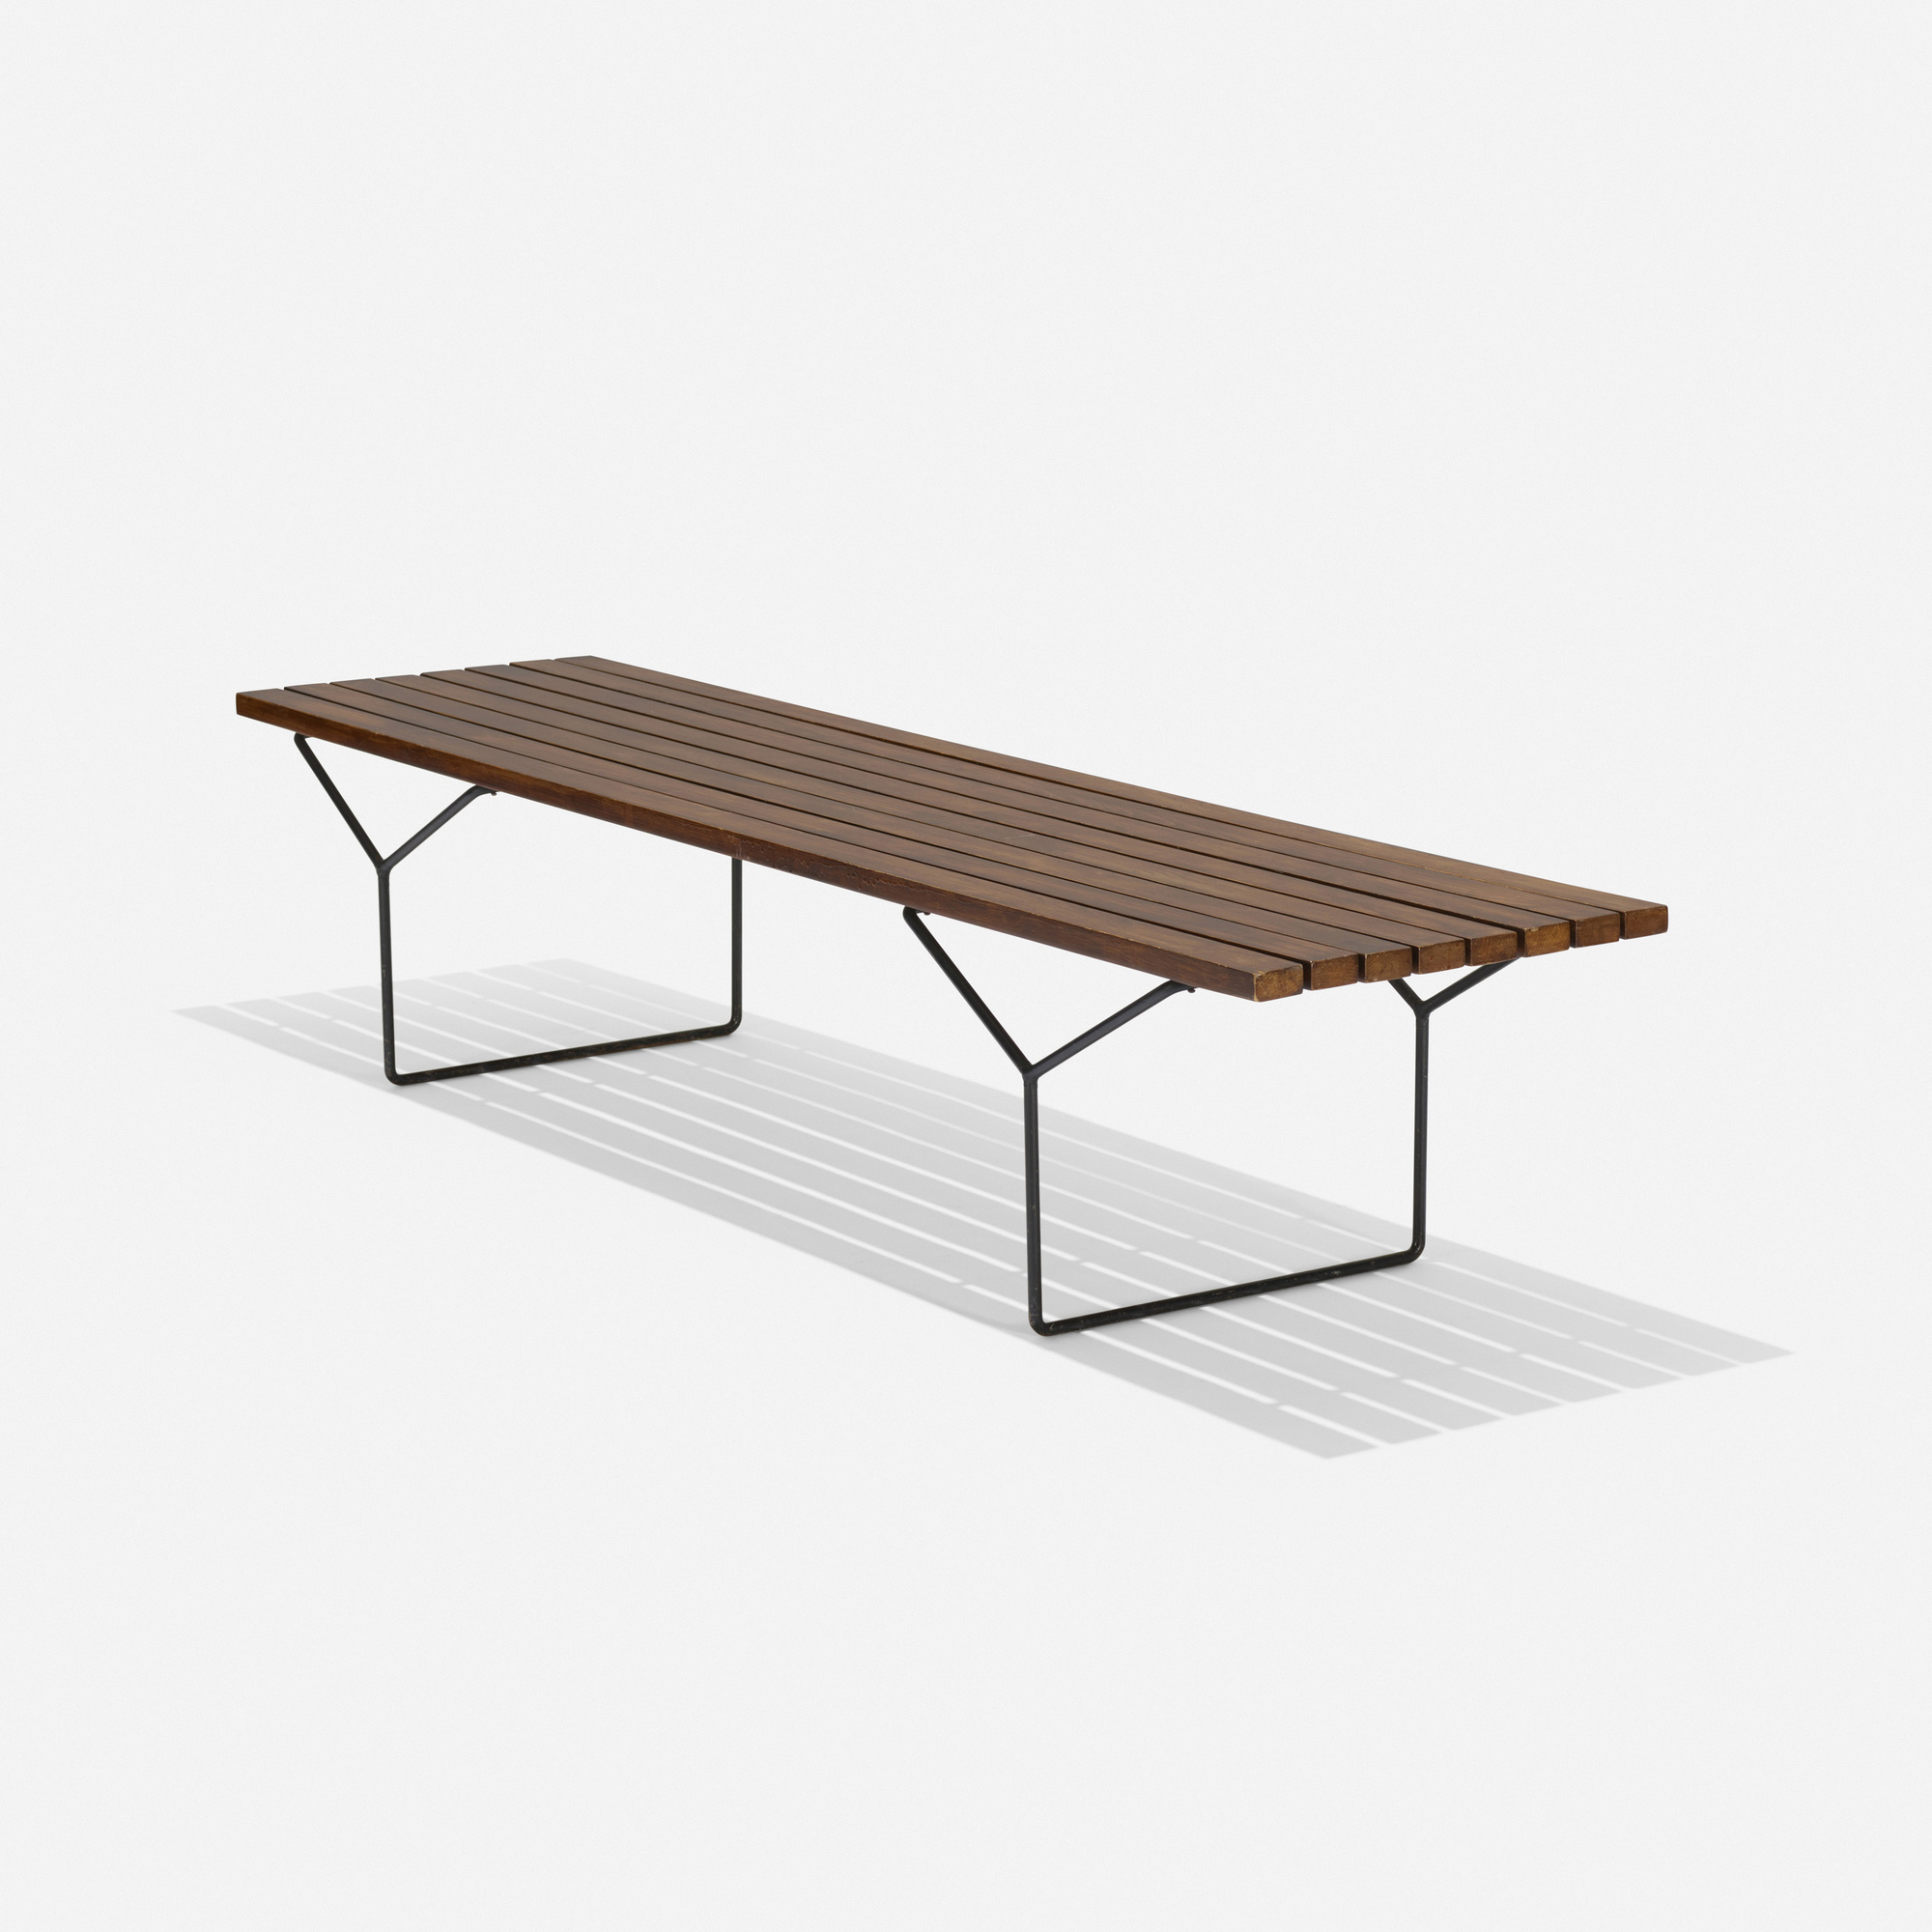 172: Harry Bertoia / slat bench (1 of 3)